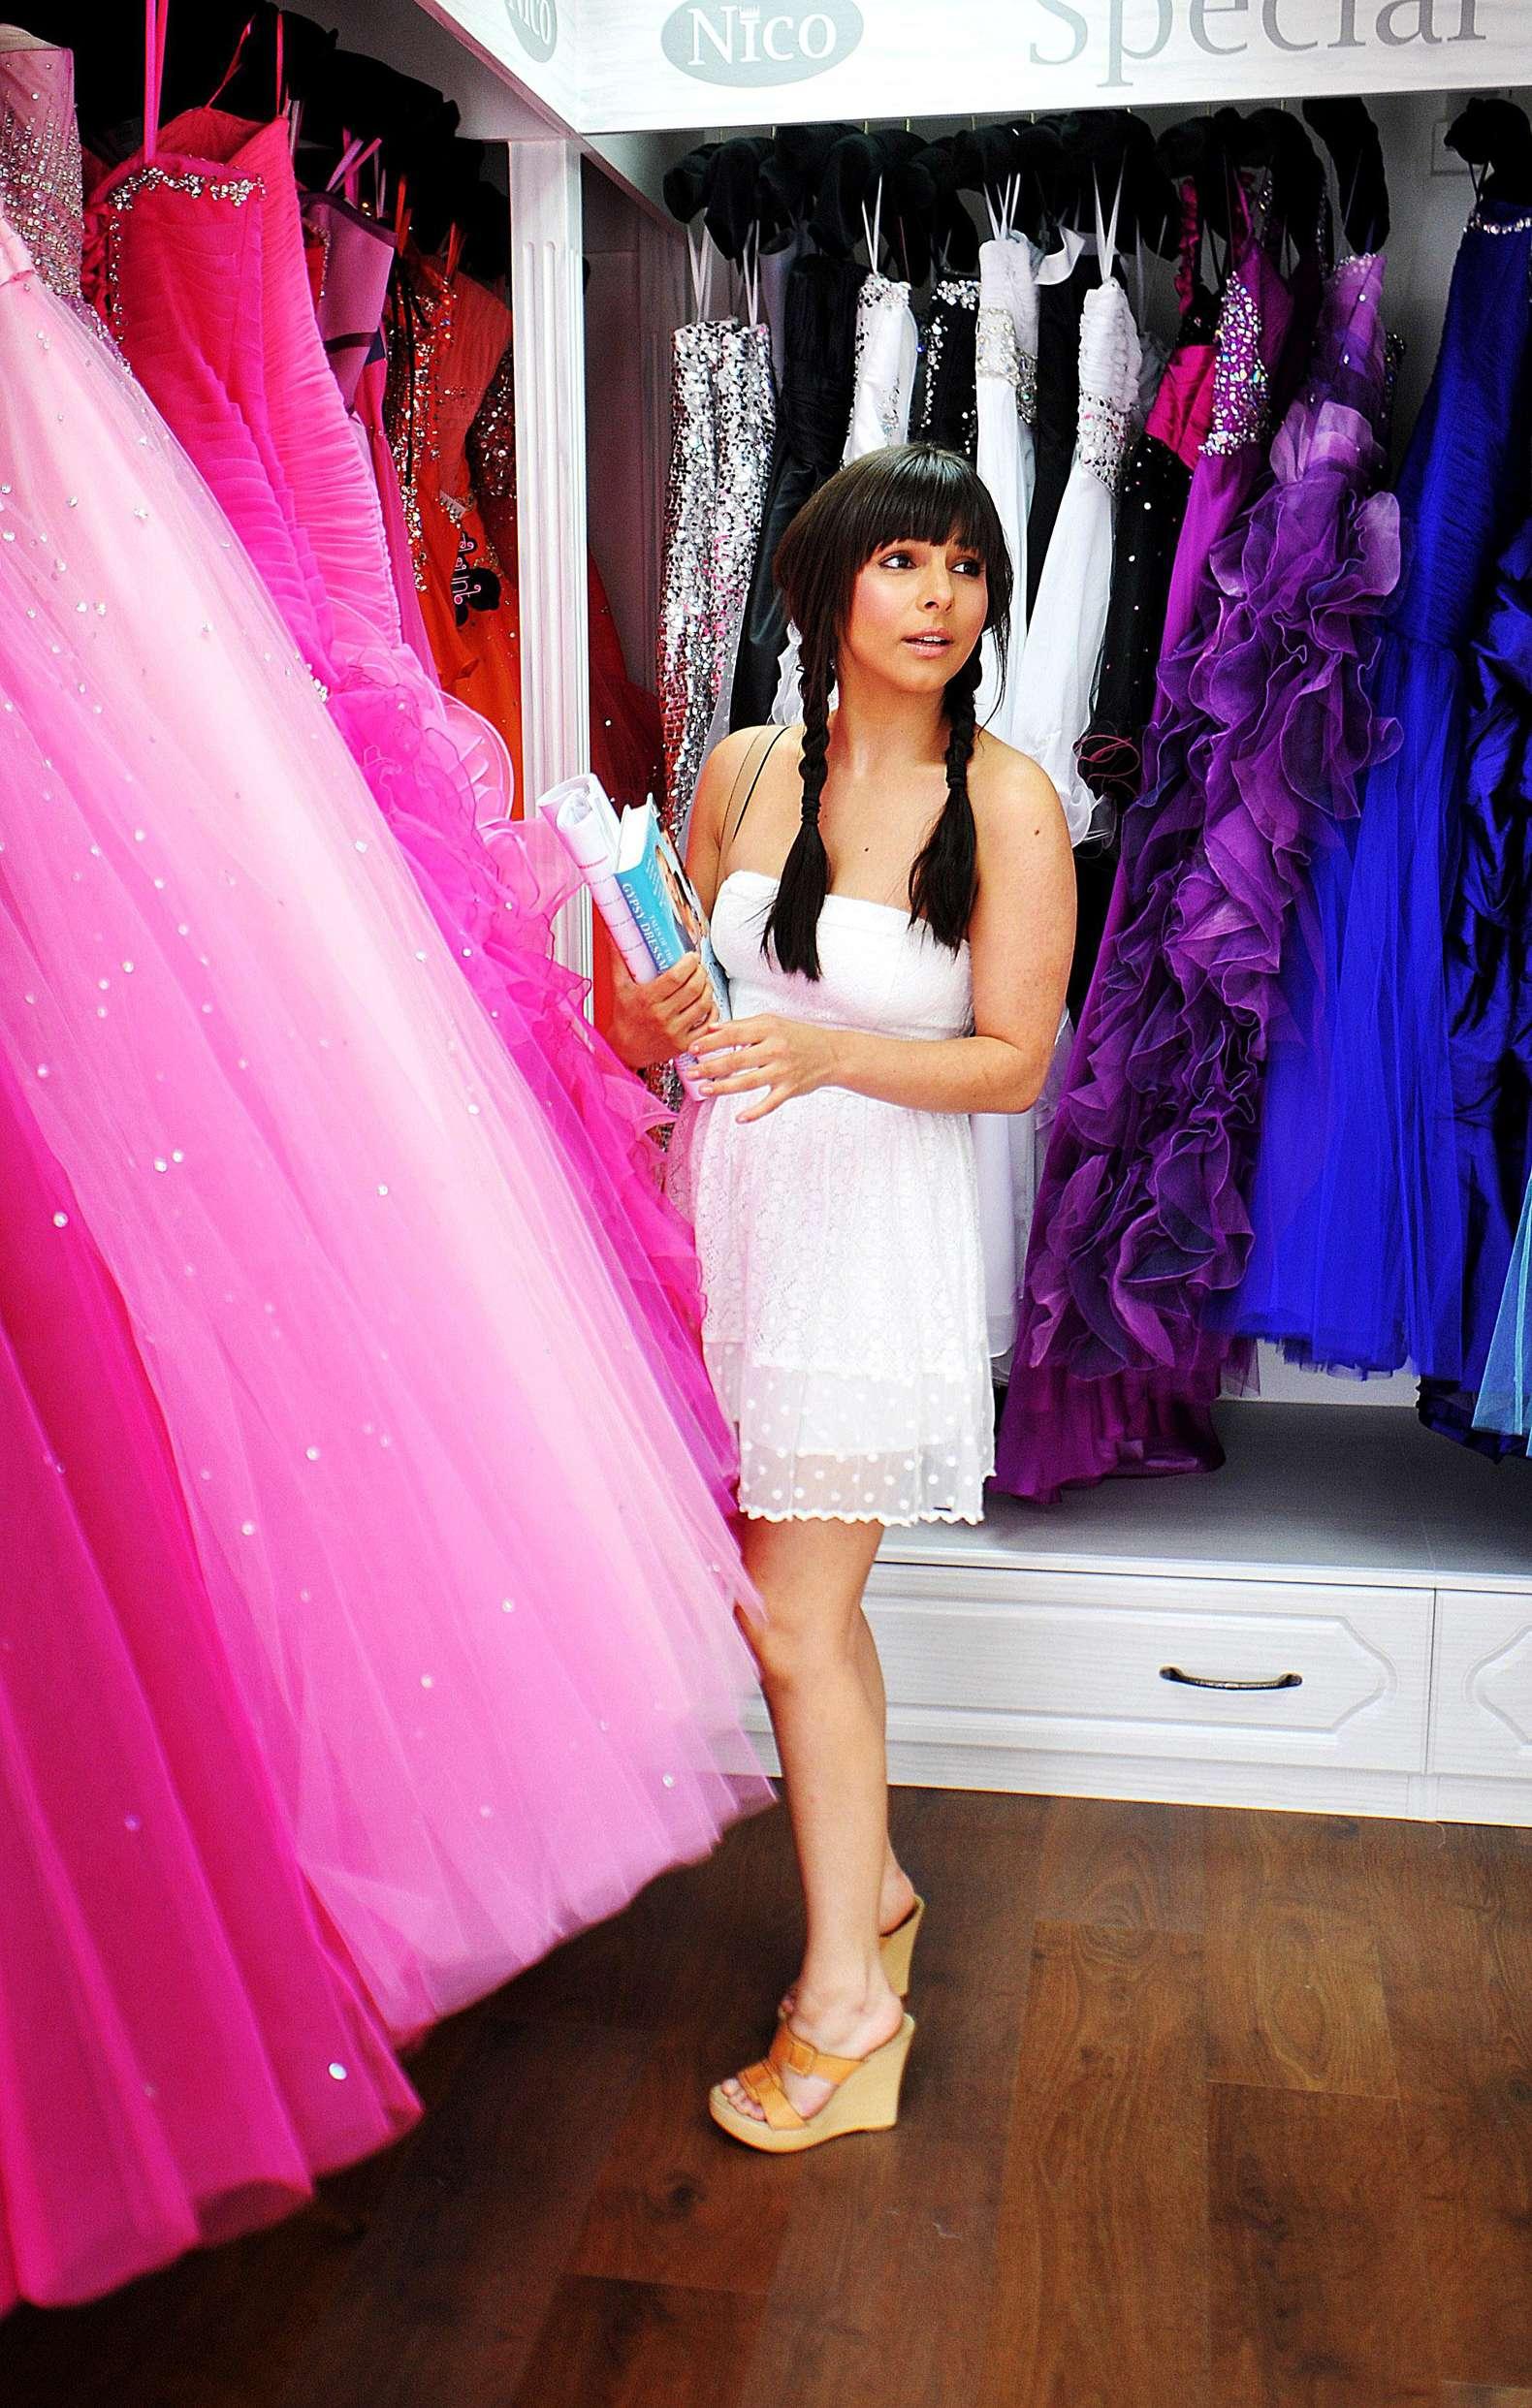 Moderno Vestidos De Novia Nico Liverpool Foto - Ideas de Estilos de ...